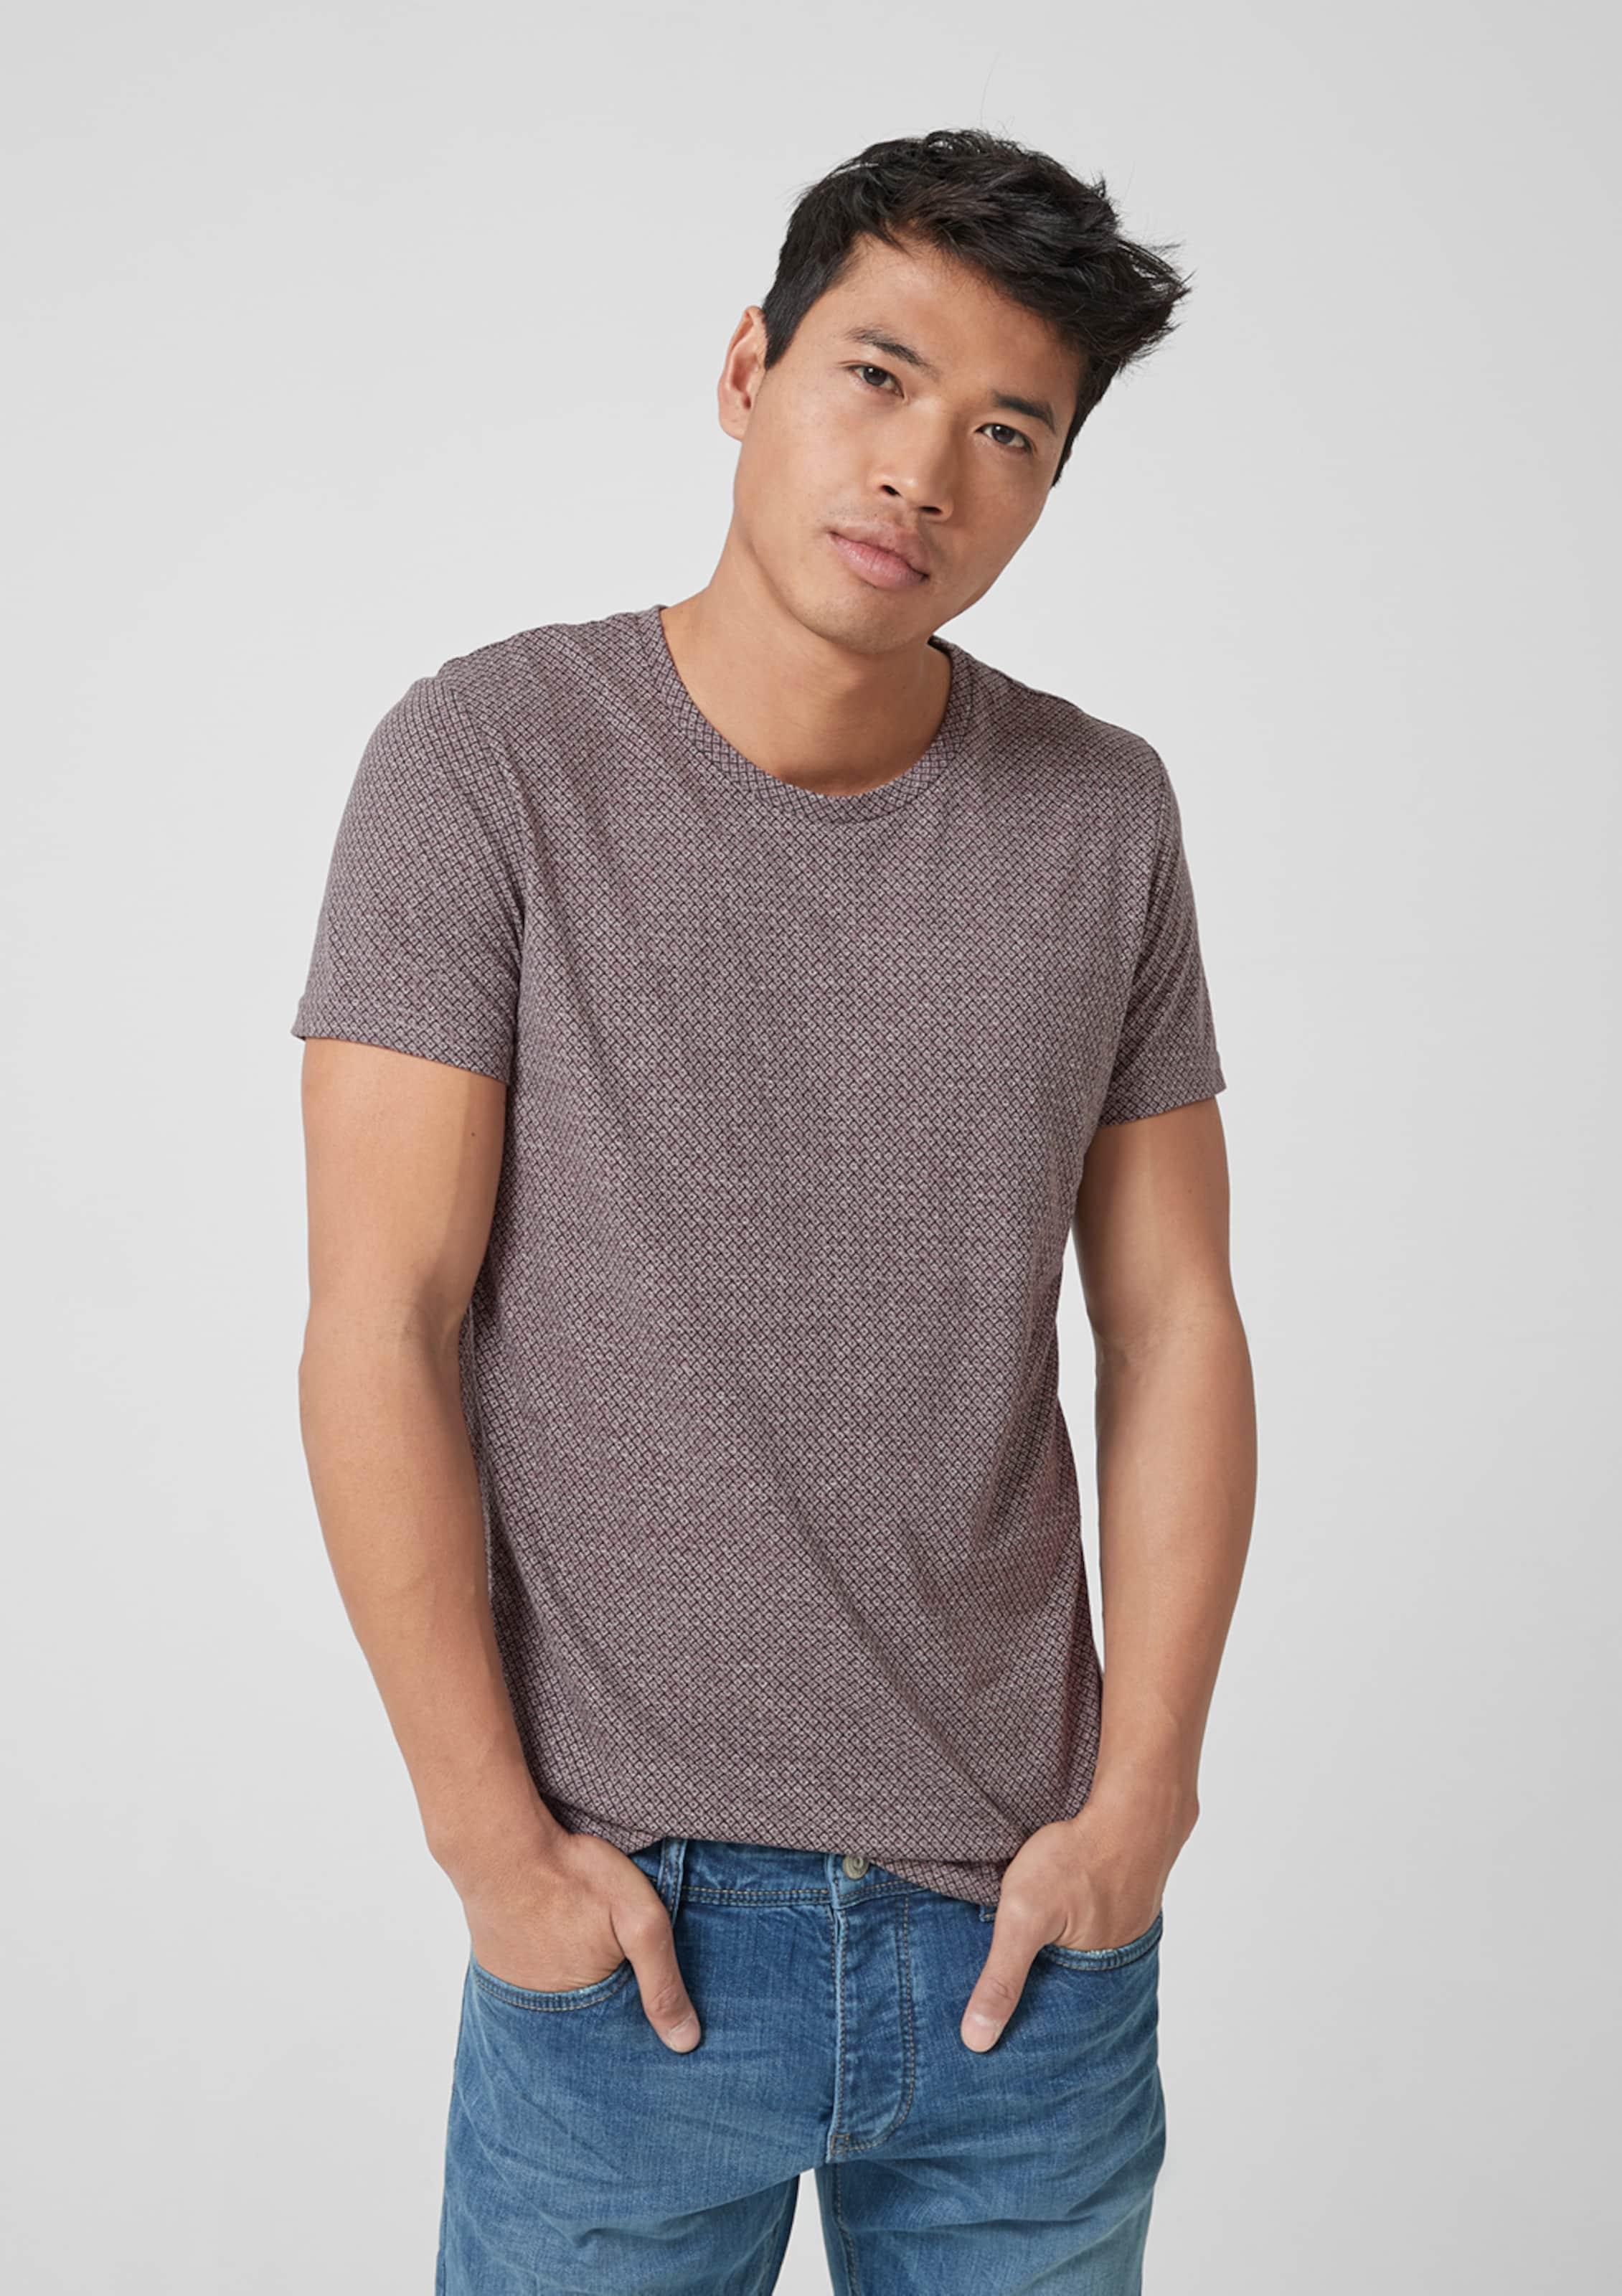 Designed In Pastelllila Q shirt s By T vb6g7IYfy